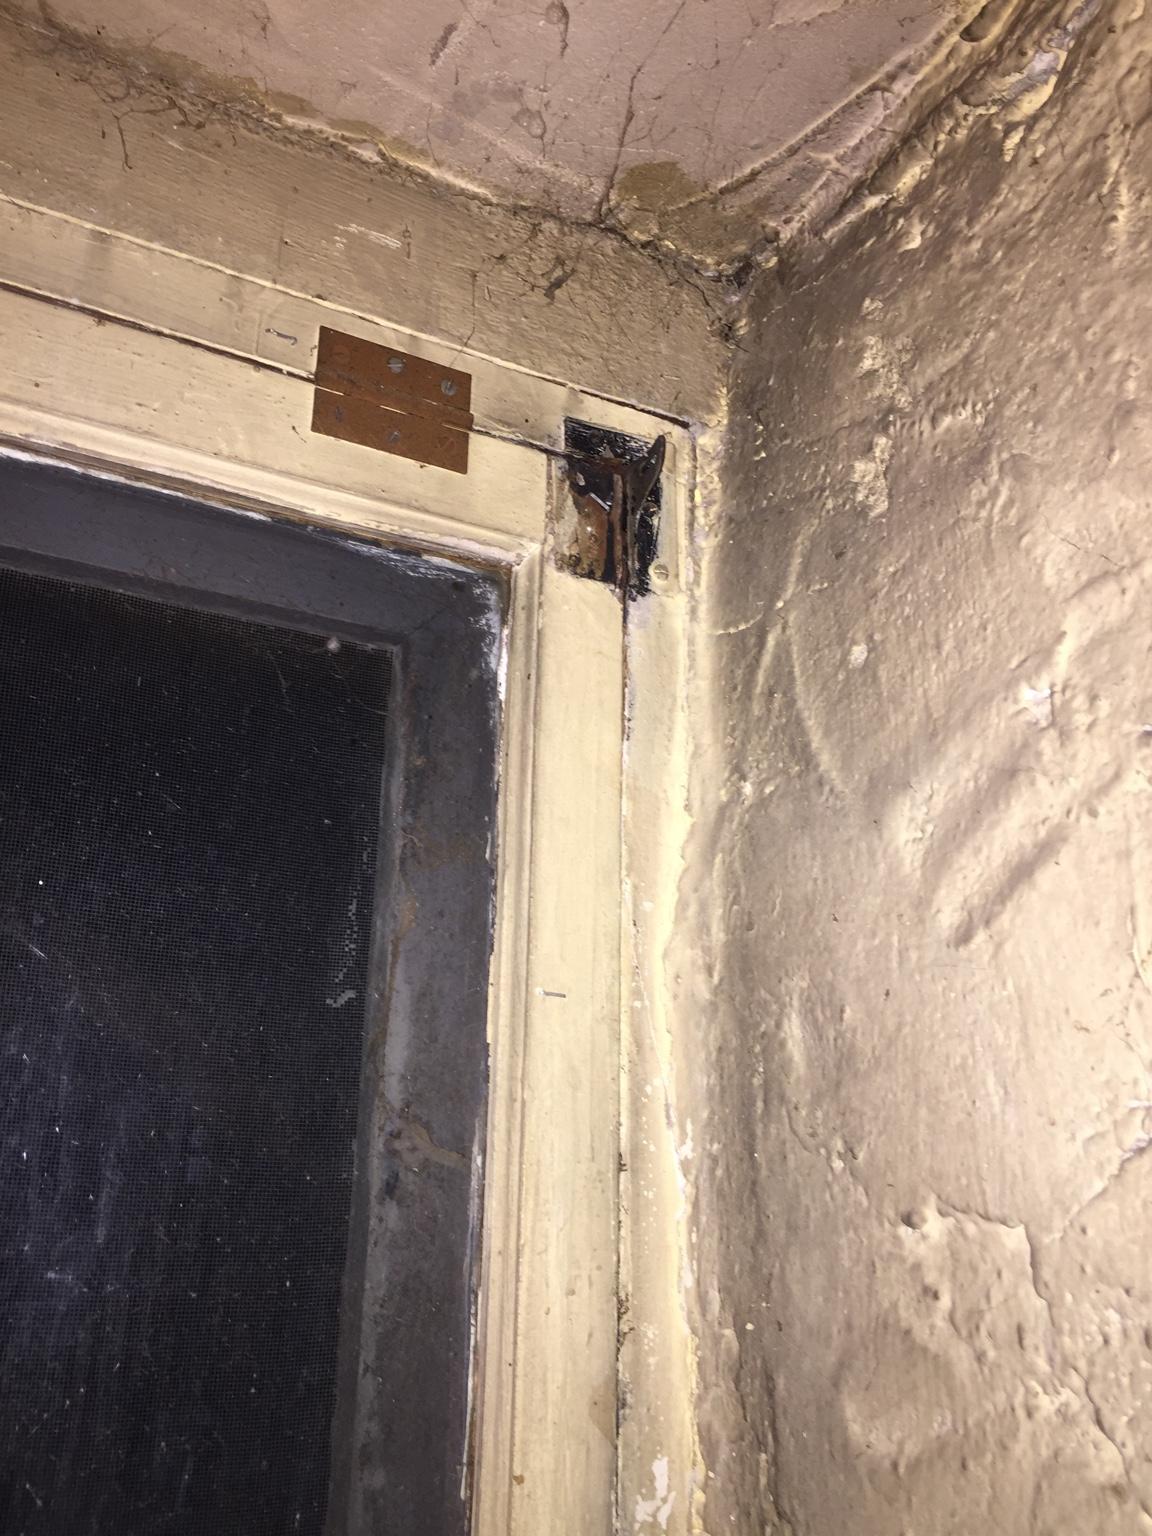 diy chatroom home improvement forum basement replacement window